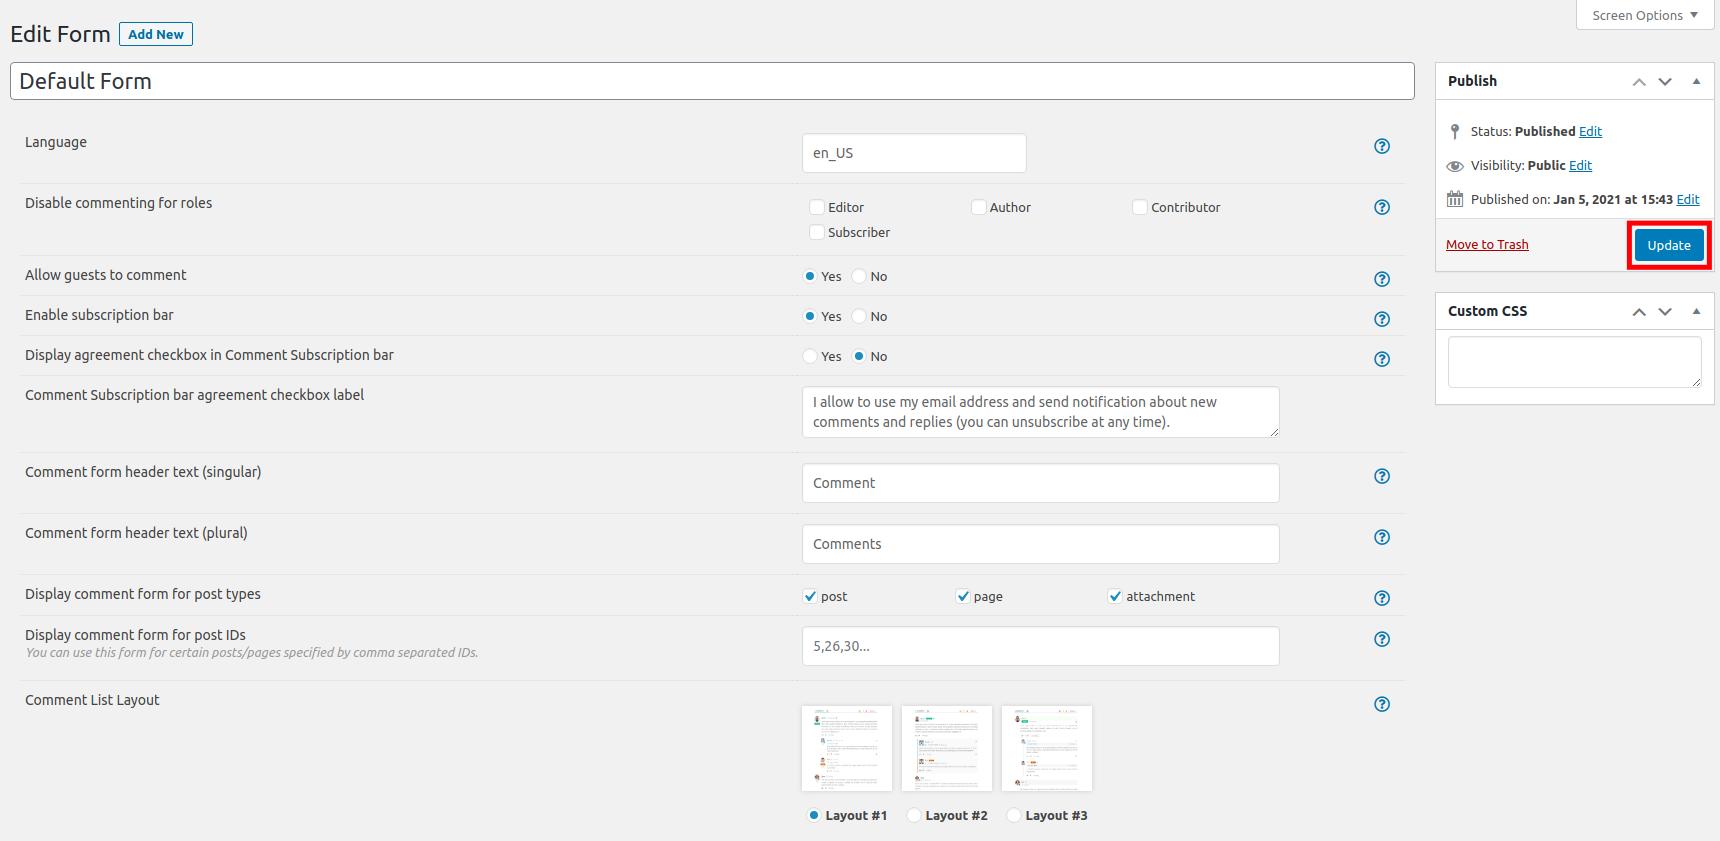 Modifying a Form in wpDiscuz